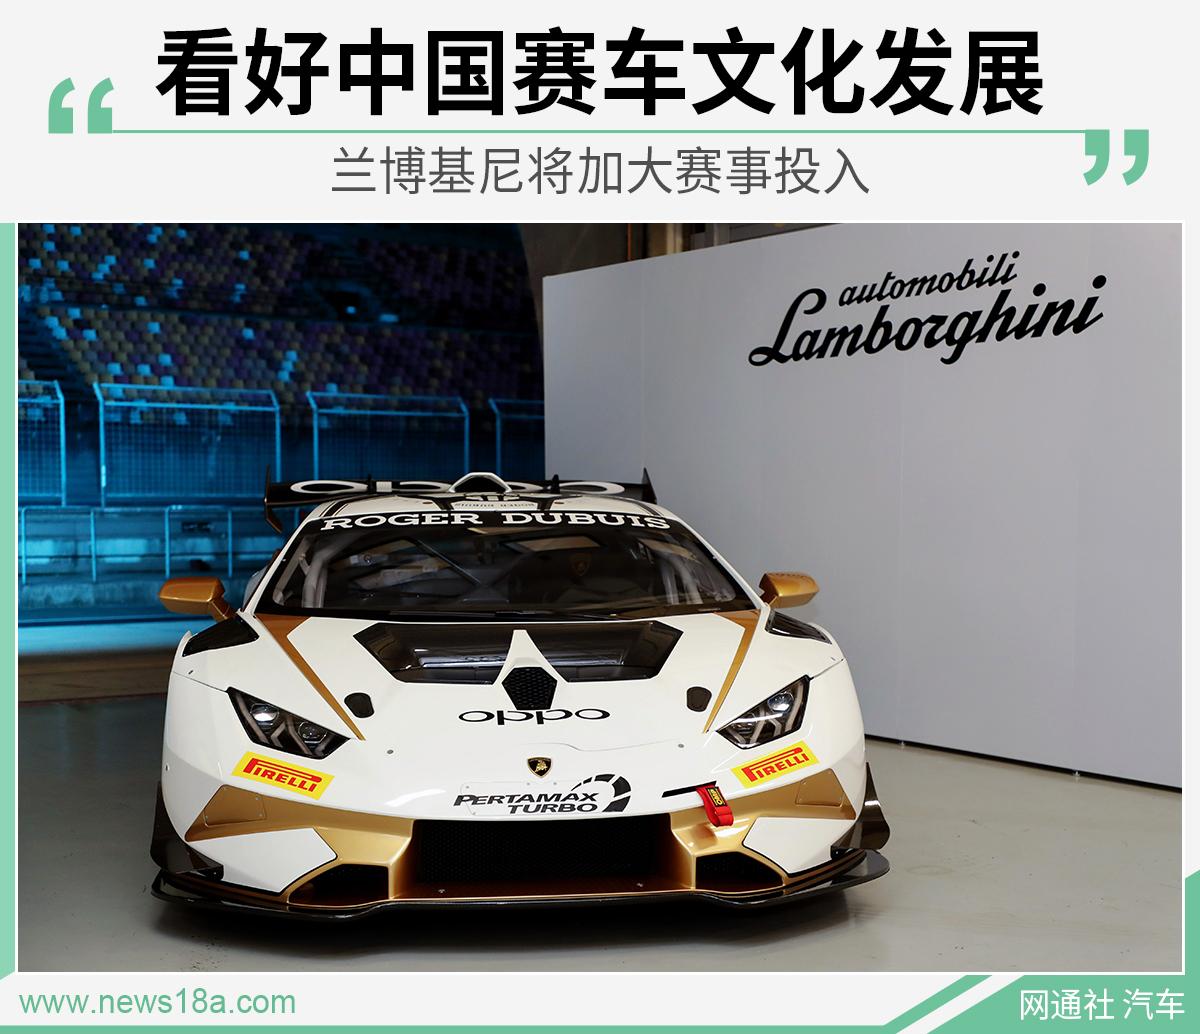 http://www.weixinrensheng.com/qichekong/780227.html